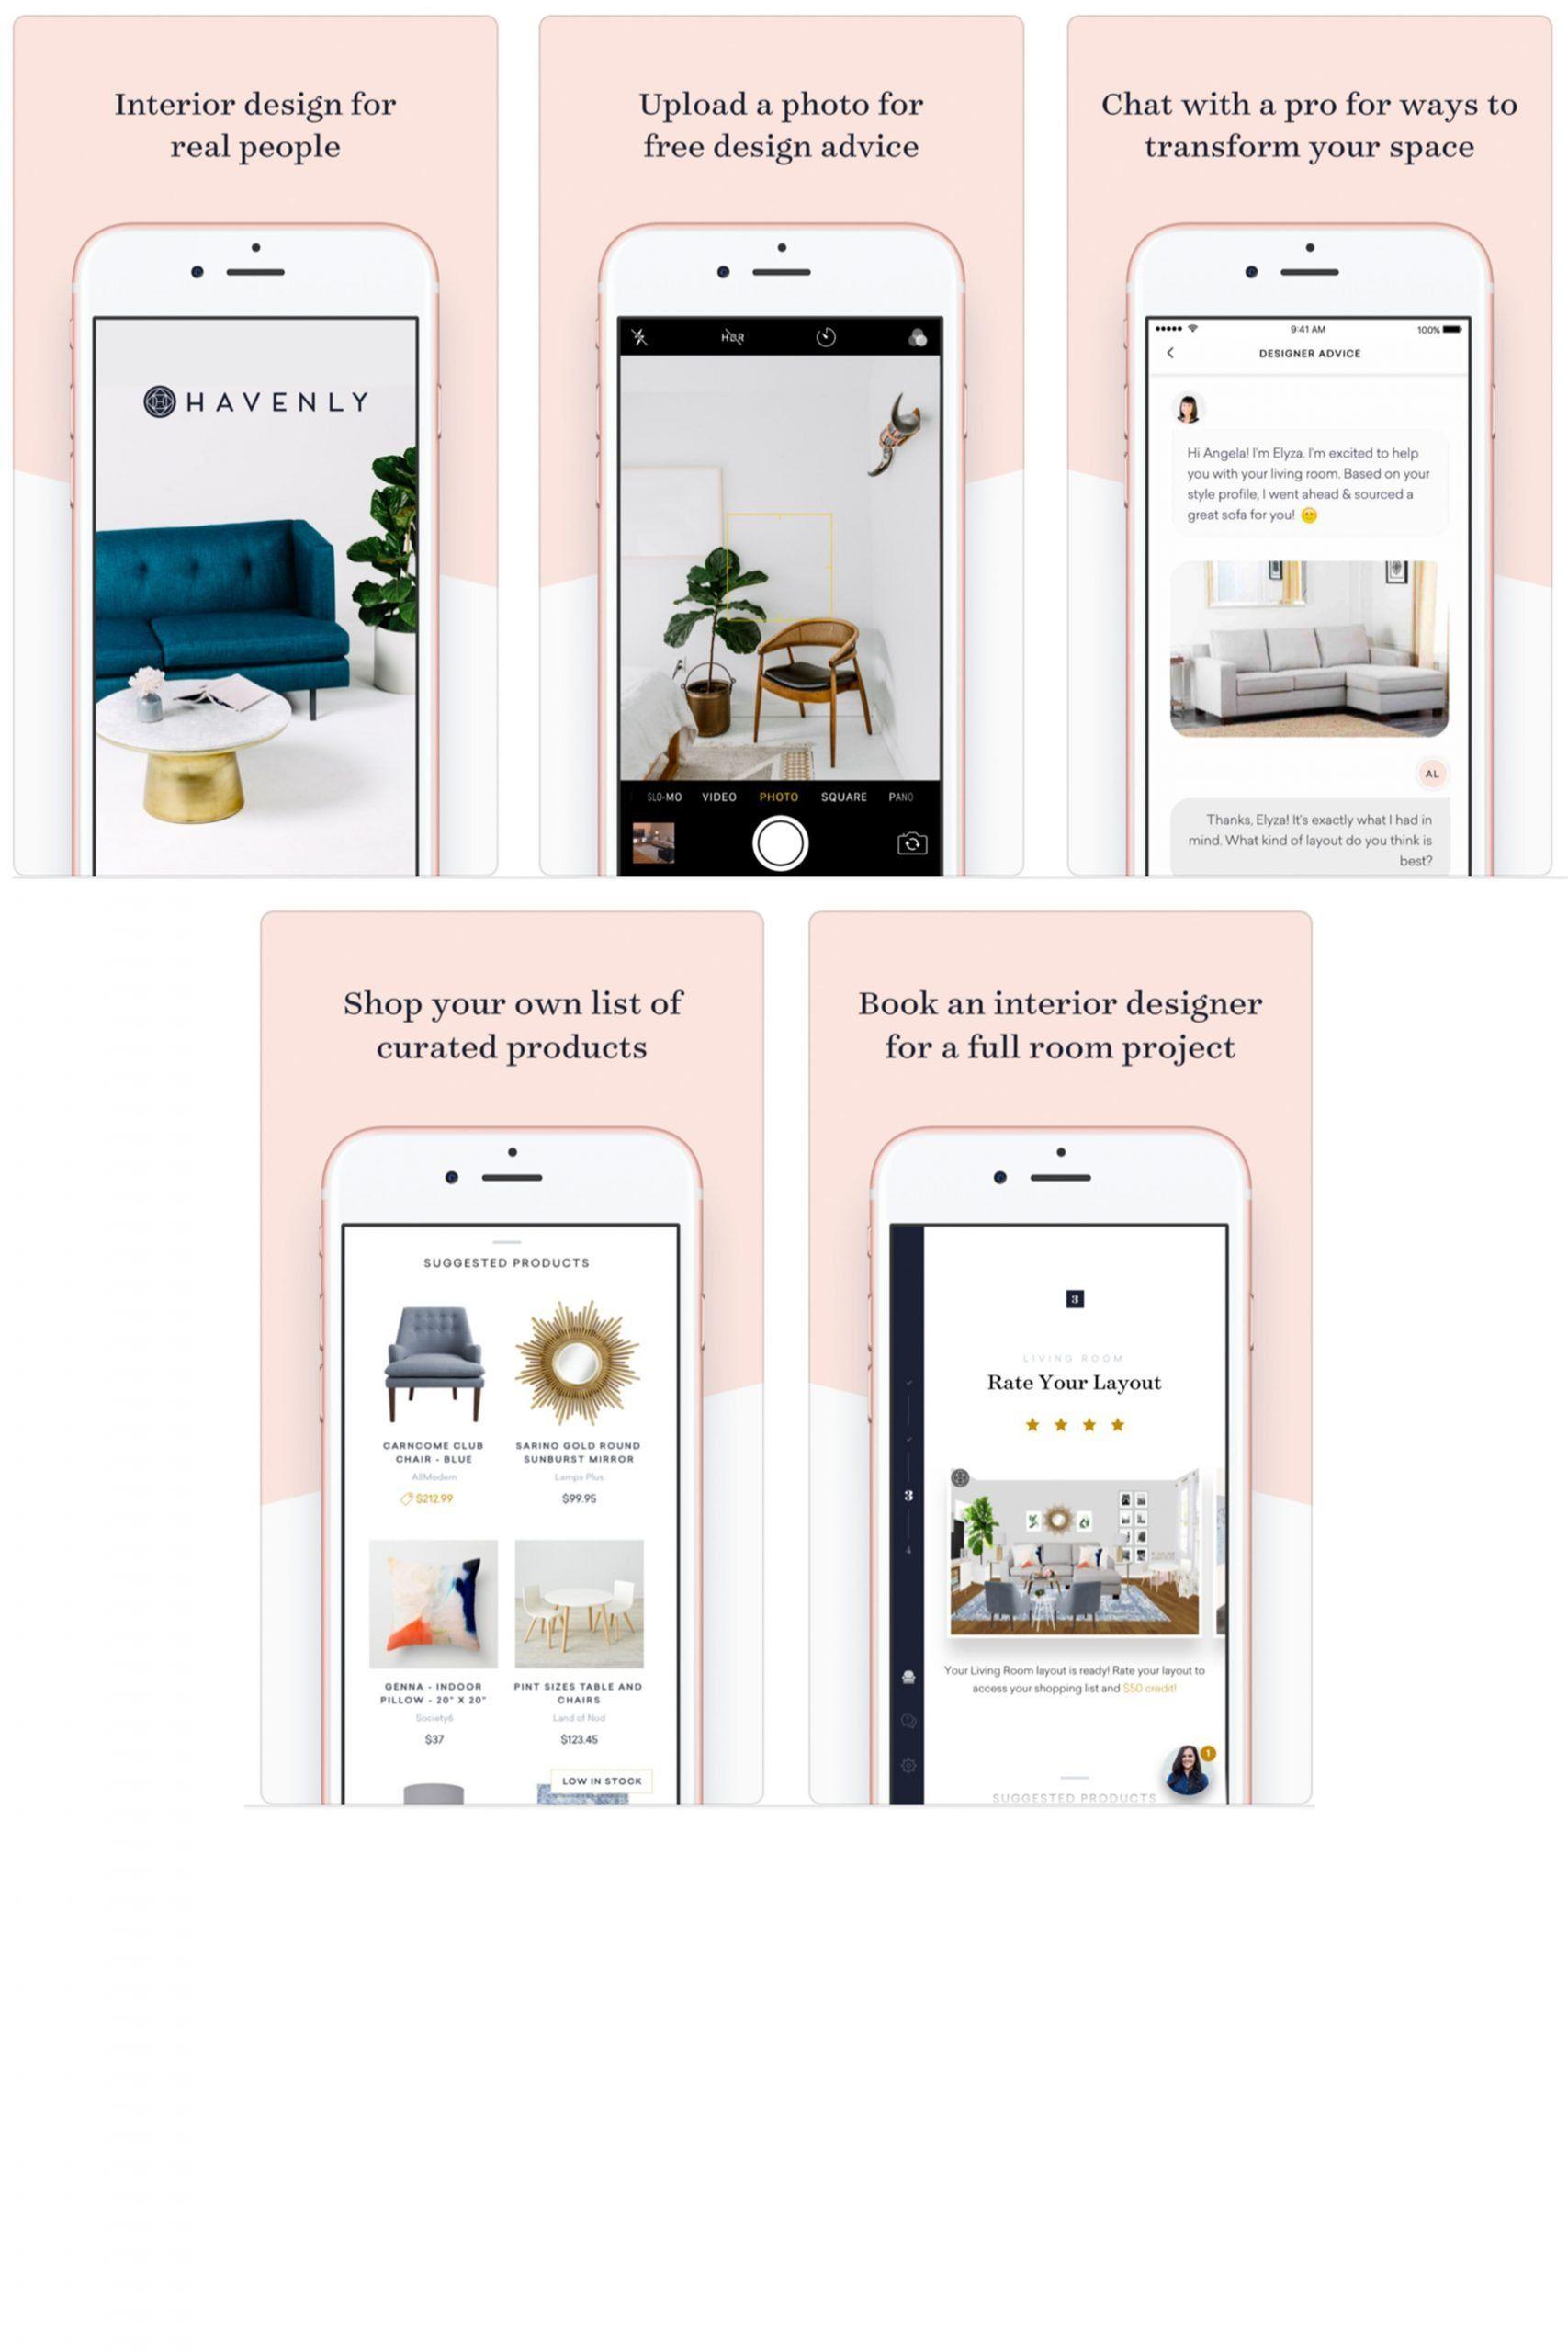 Bedroom Design Tool Online Free Luxury 10 Genius Interior Design Apps Simple Decorating Apps To Interior Design Apps Design Home App Best Interior Design Apps